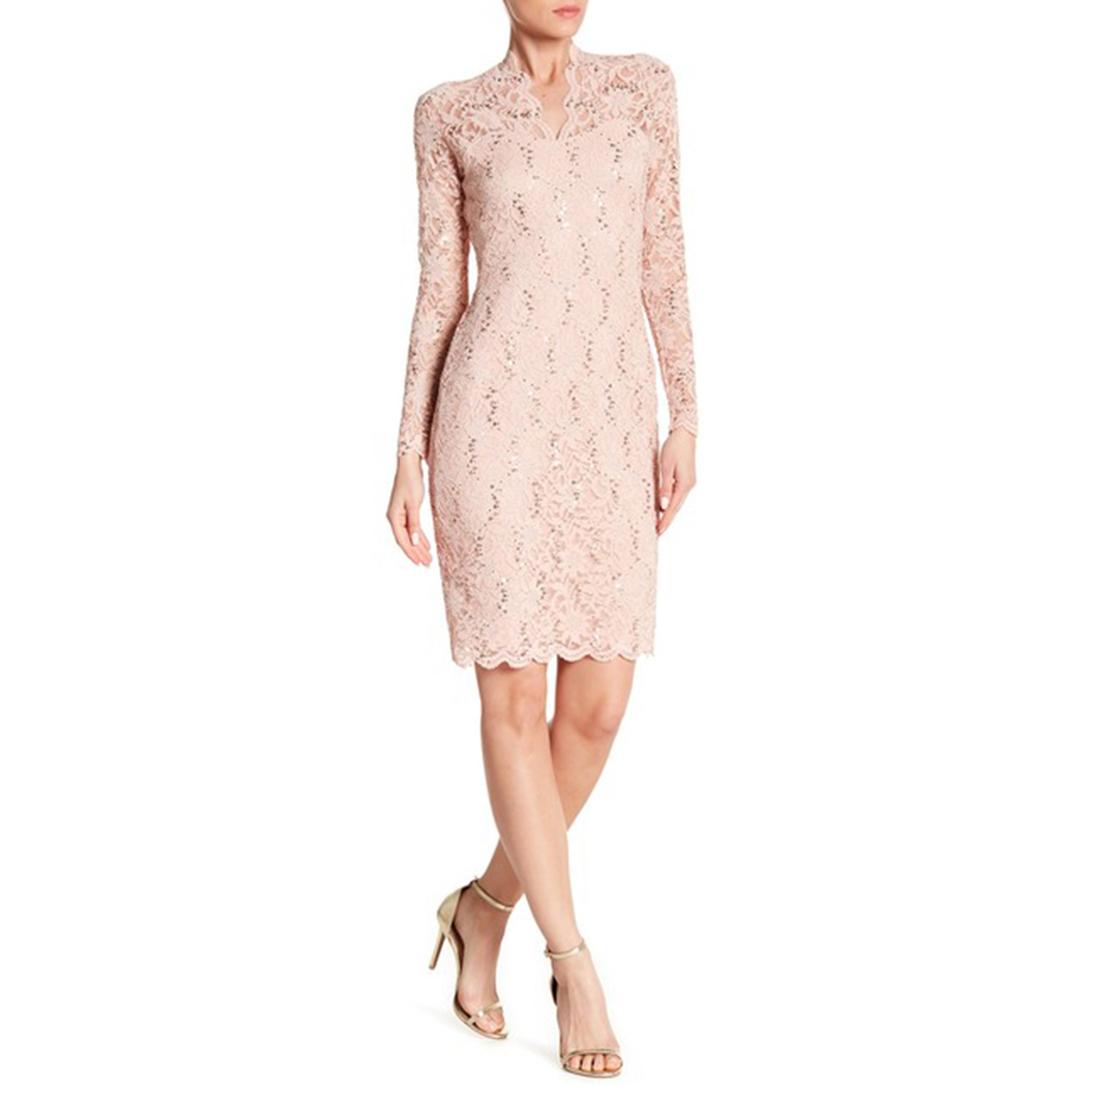 e3350520 Marina Long Sleeve Sequin Lace Dress, 261800, Blush, 16 796396711322 ...